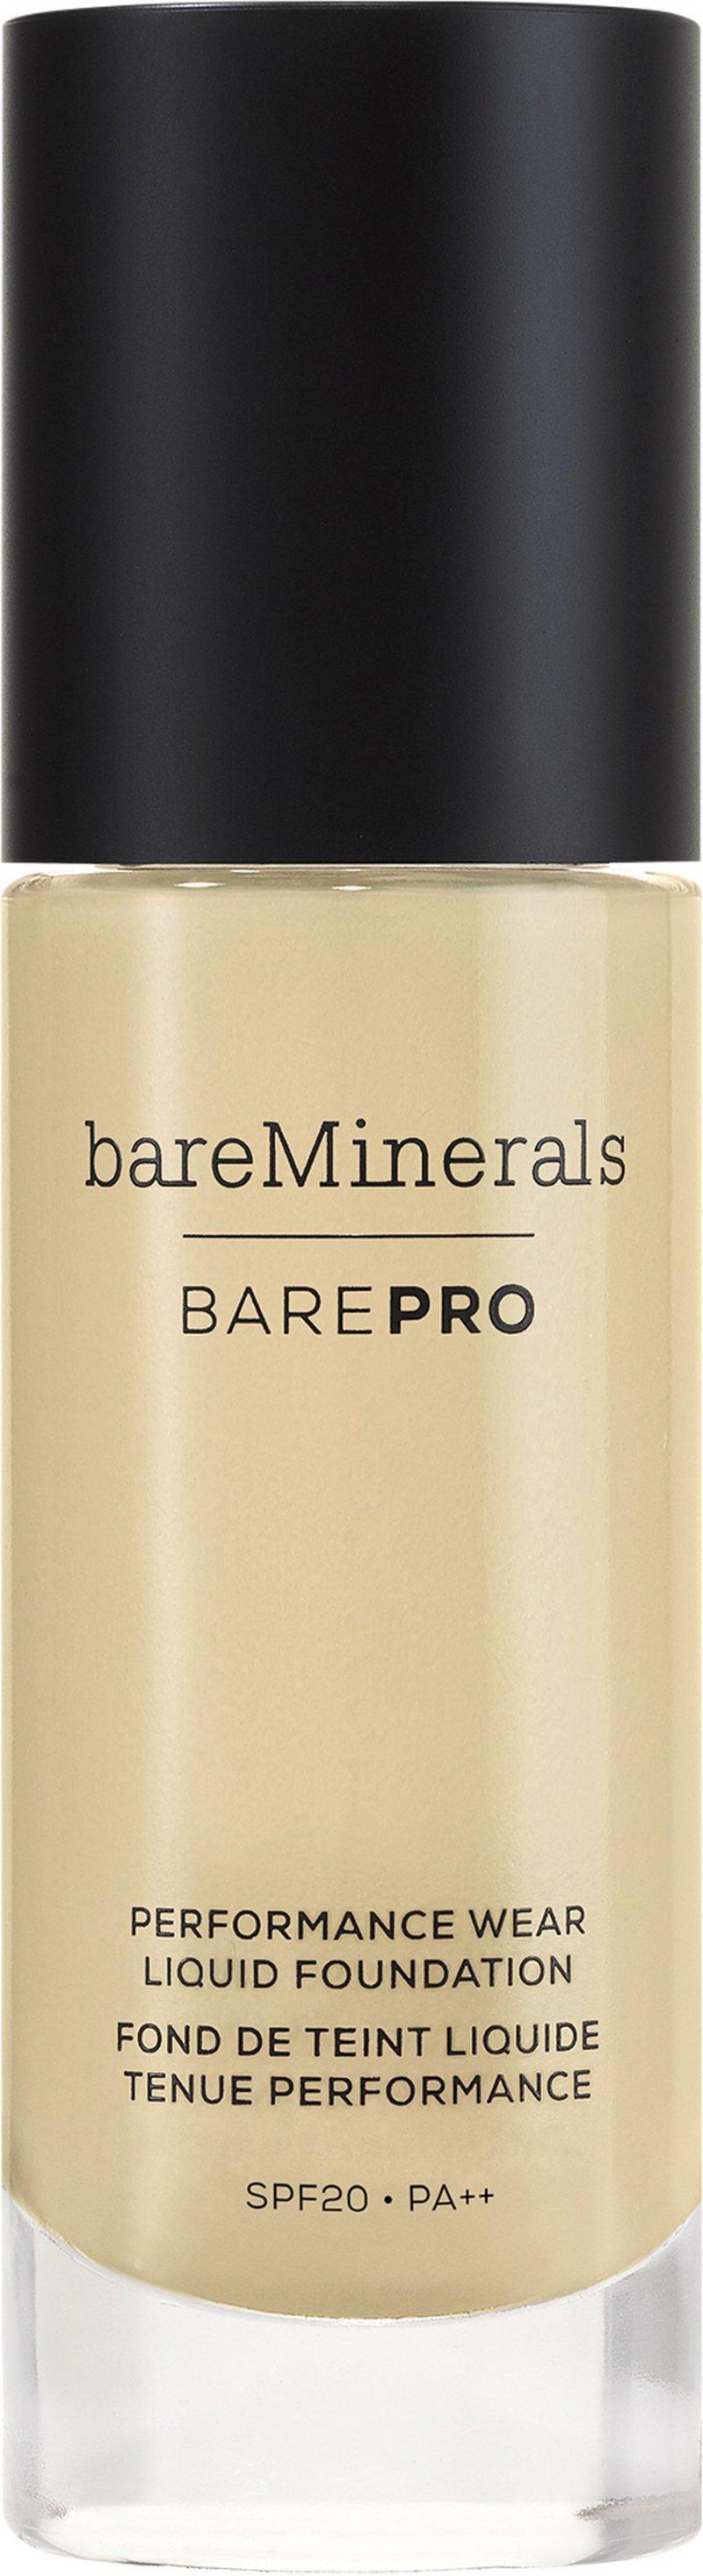 Image of   Bareminerals Foundation - Barepro Performance Wear Liquid - Natural 11